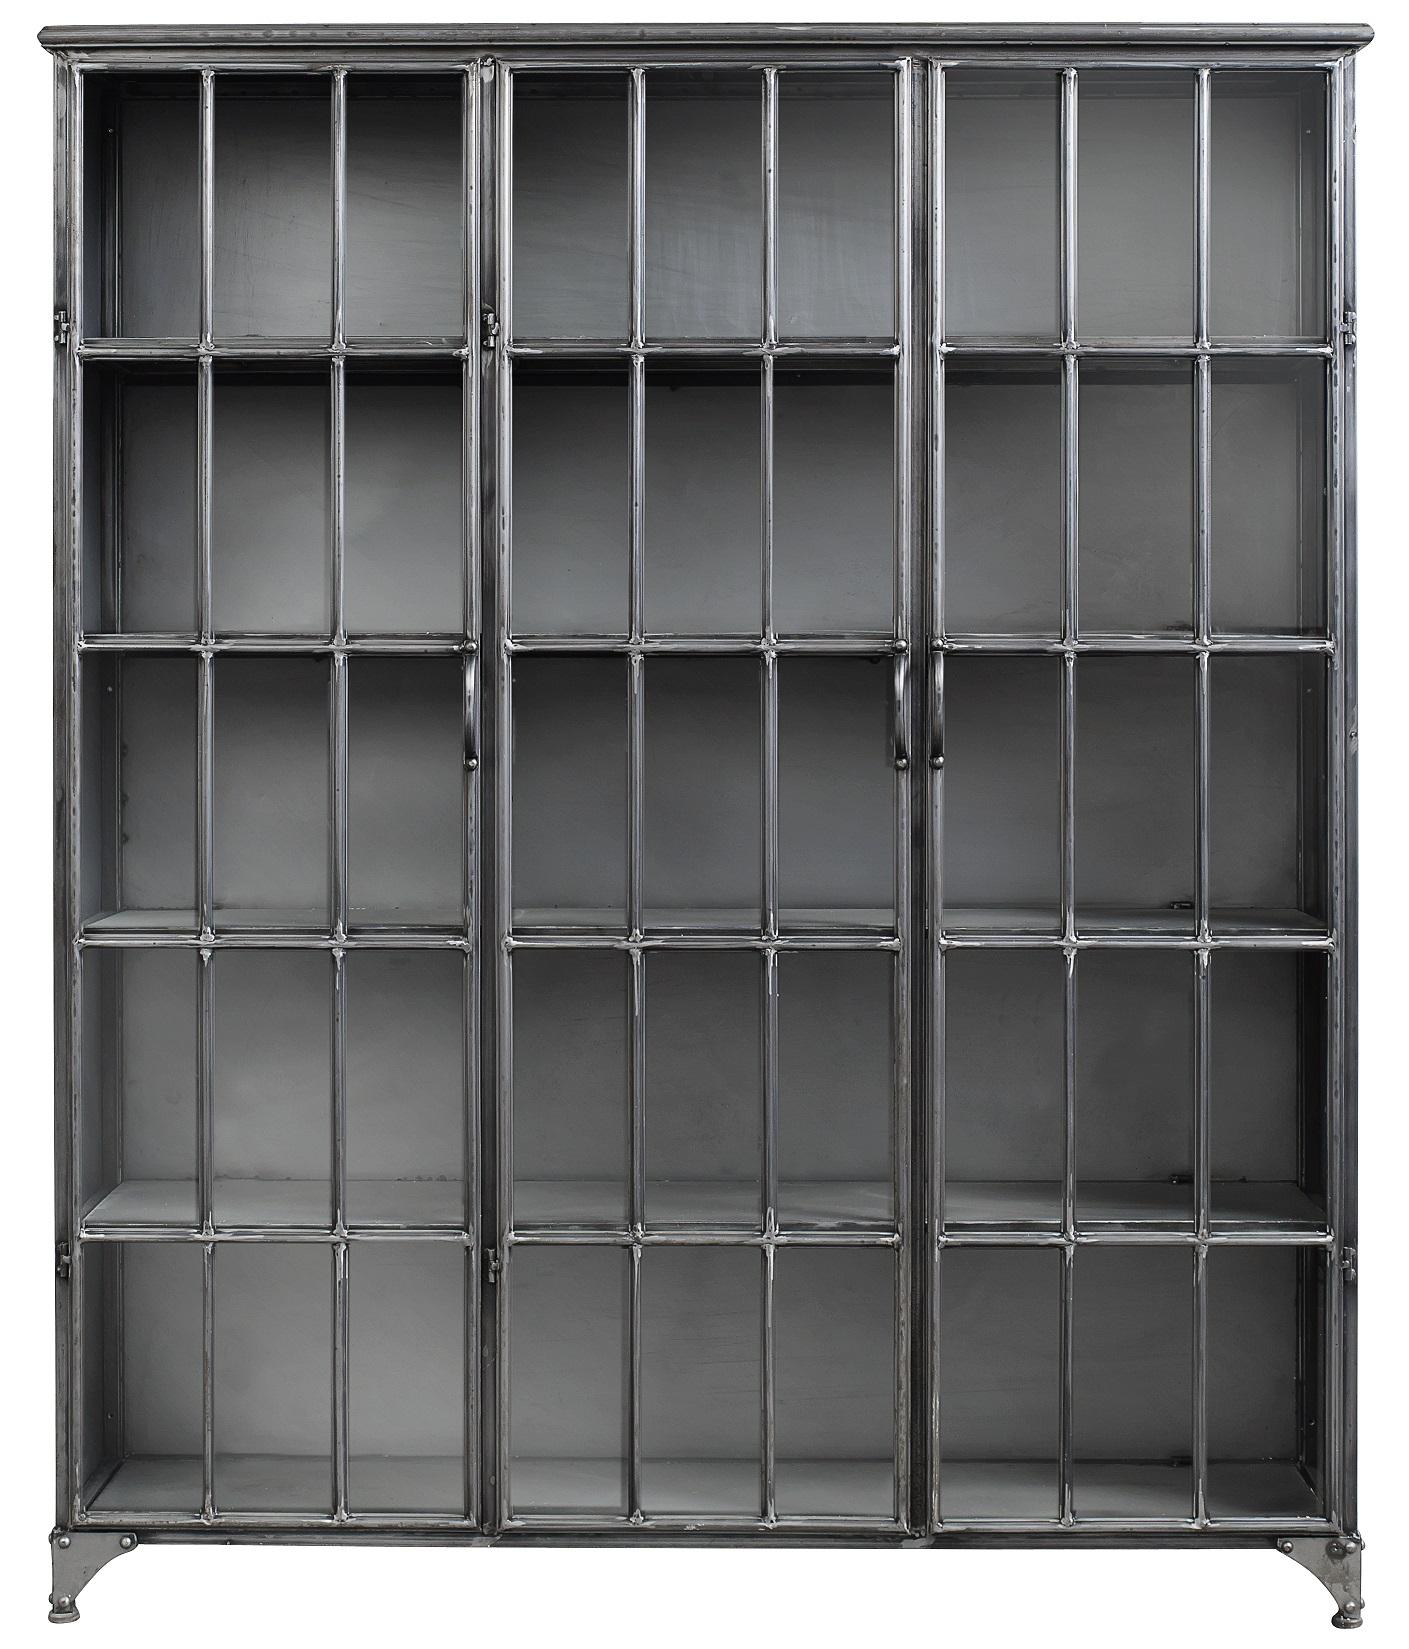 Downtown iron cabinett - Raw